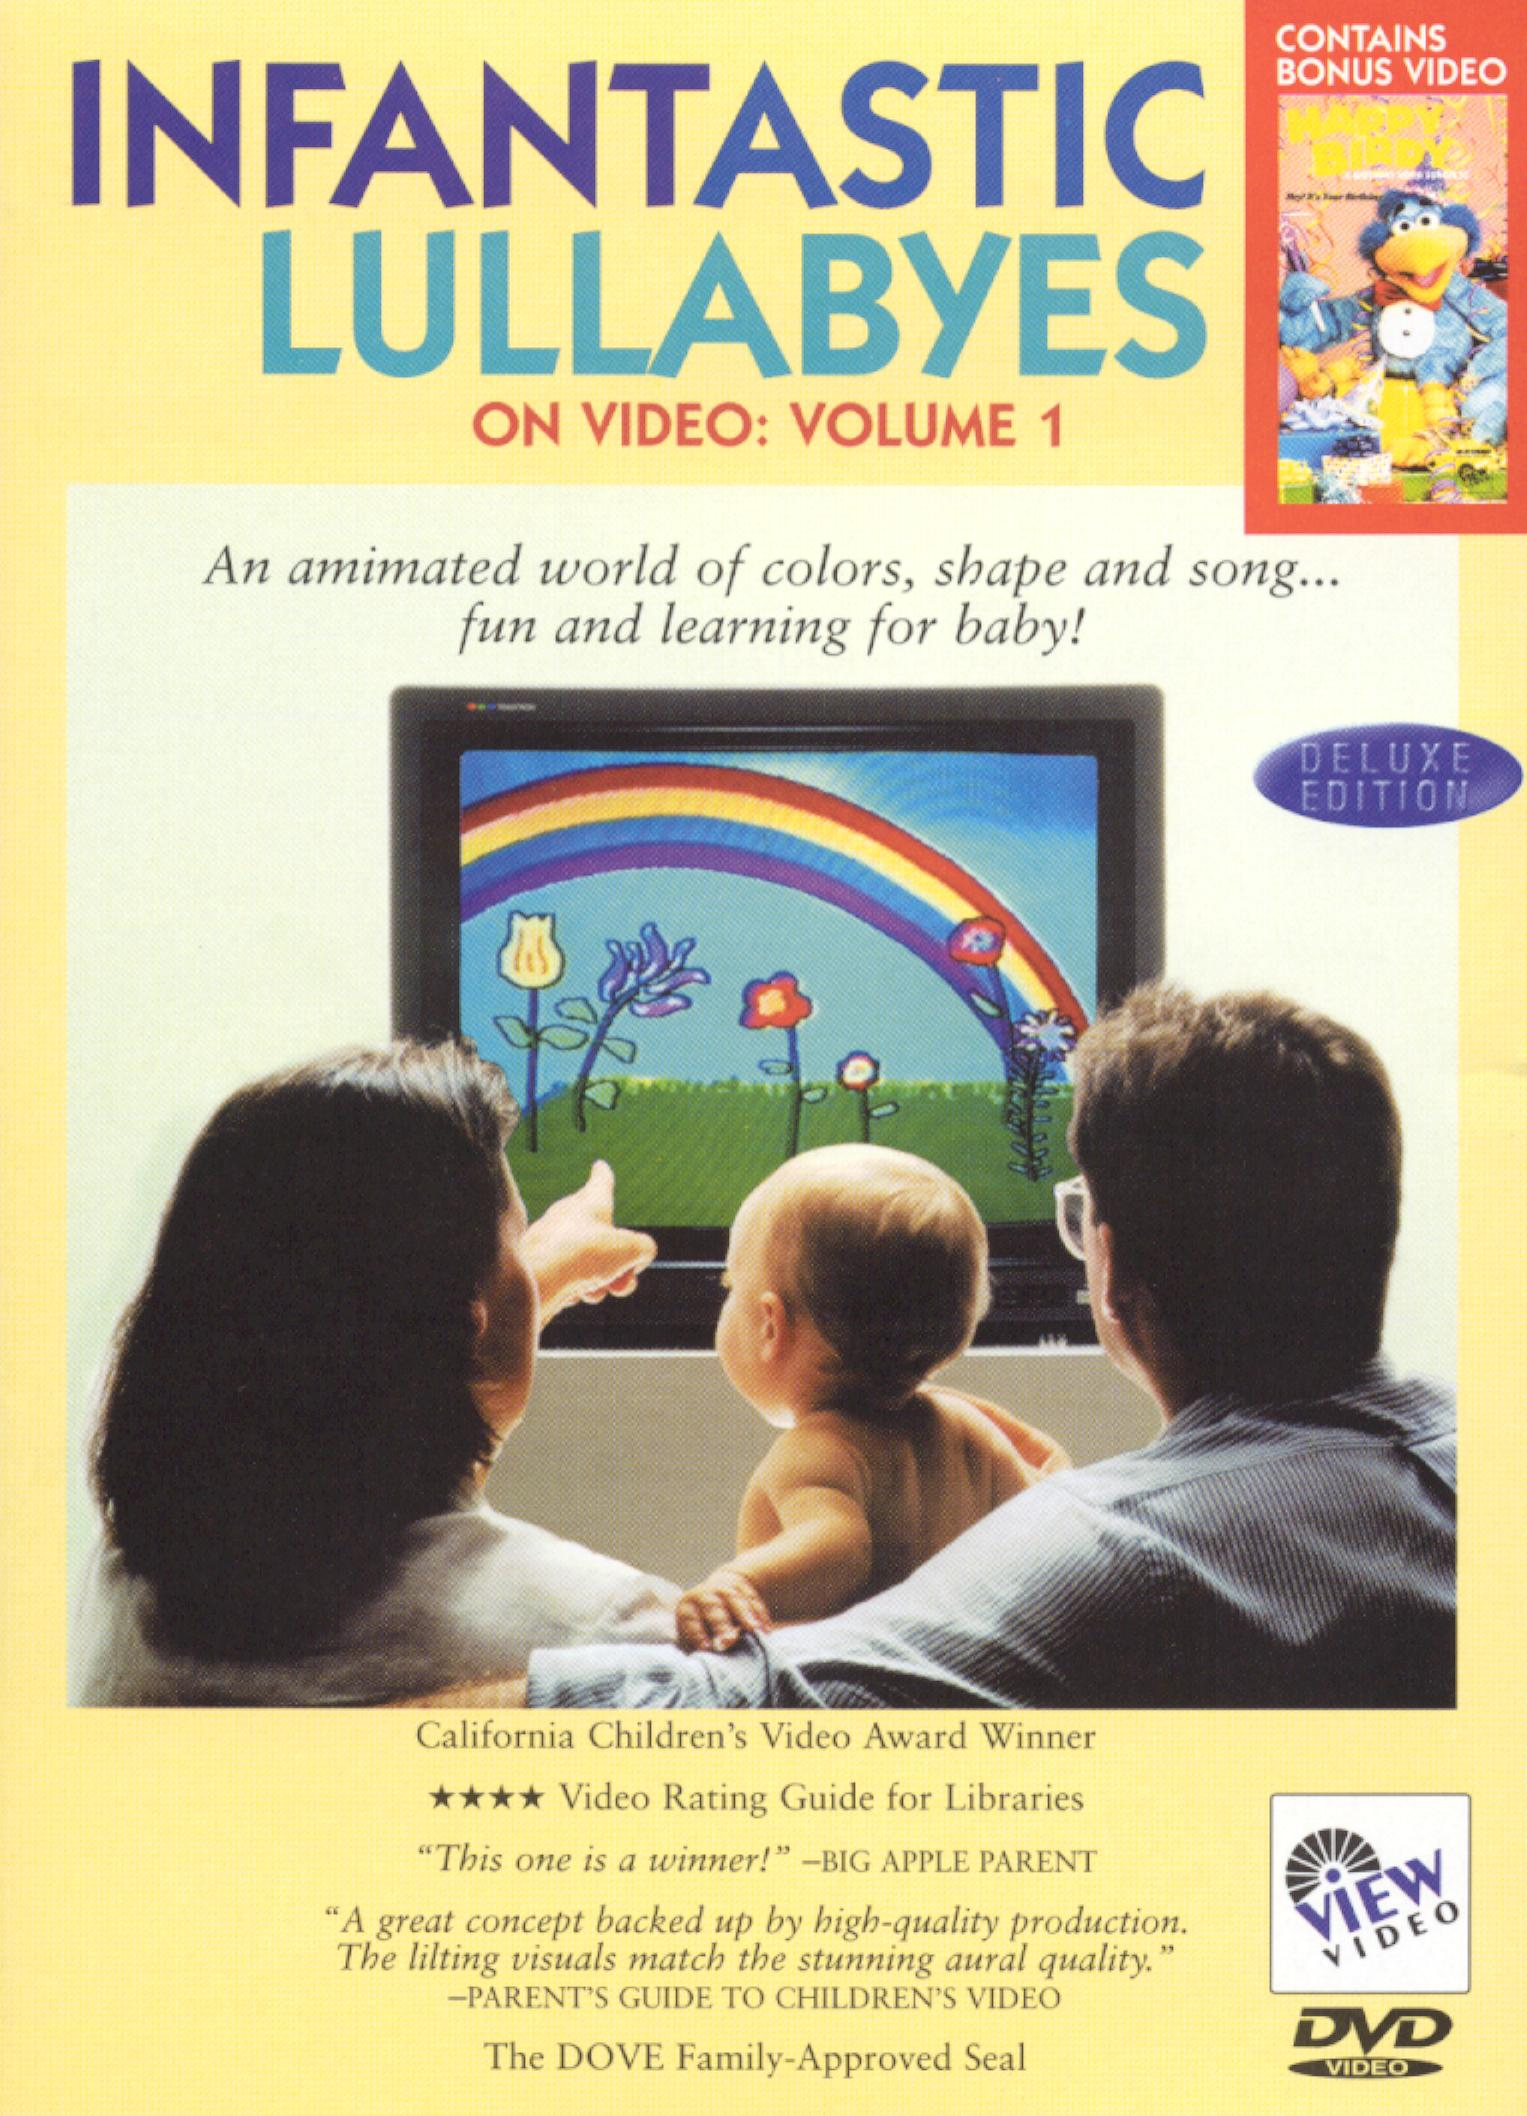 Infantastic Lullabyes on Video, Vol. 1